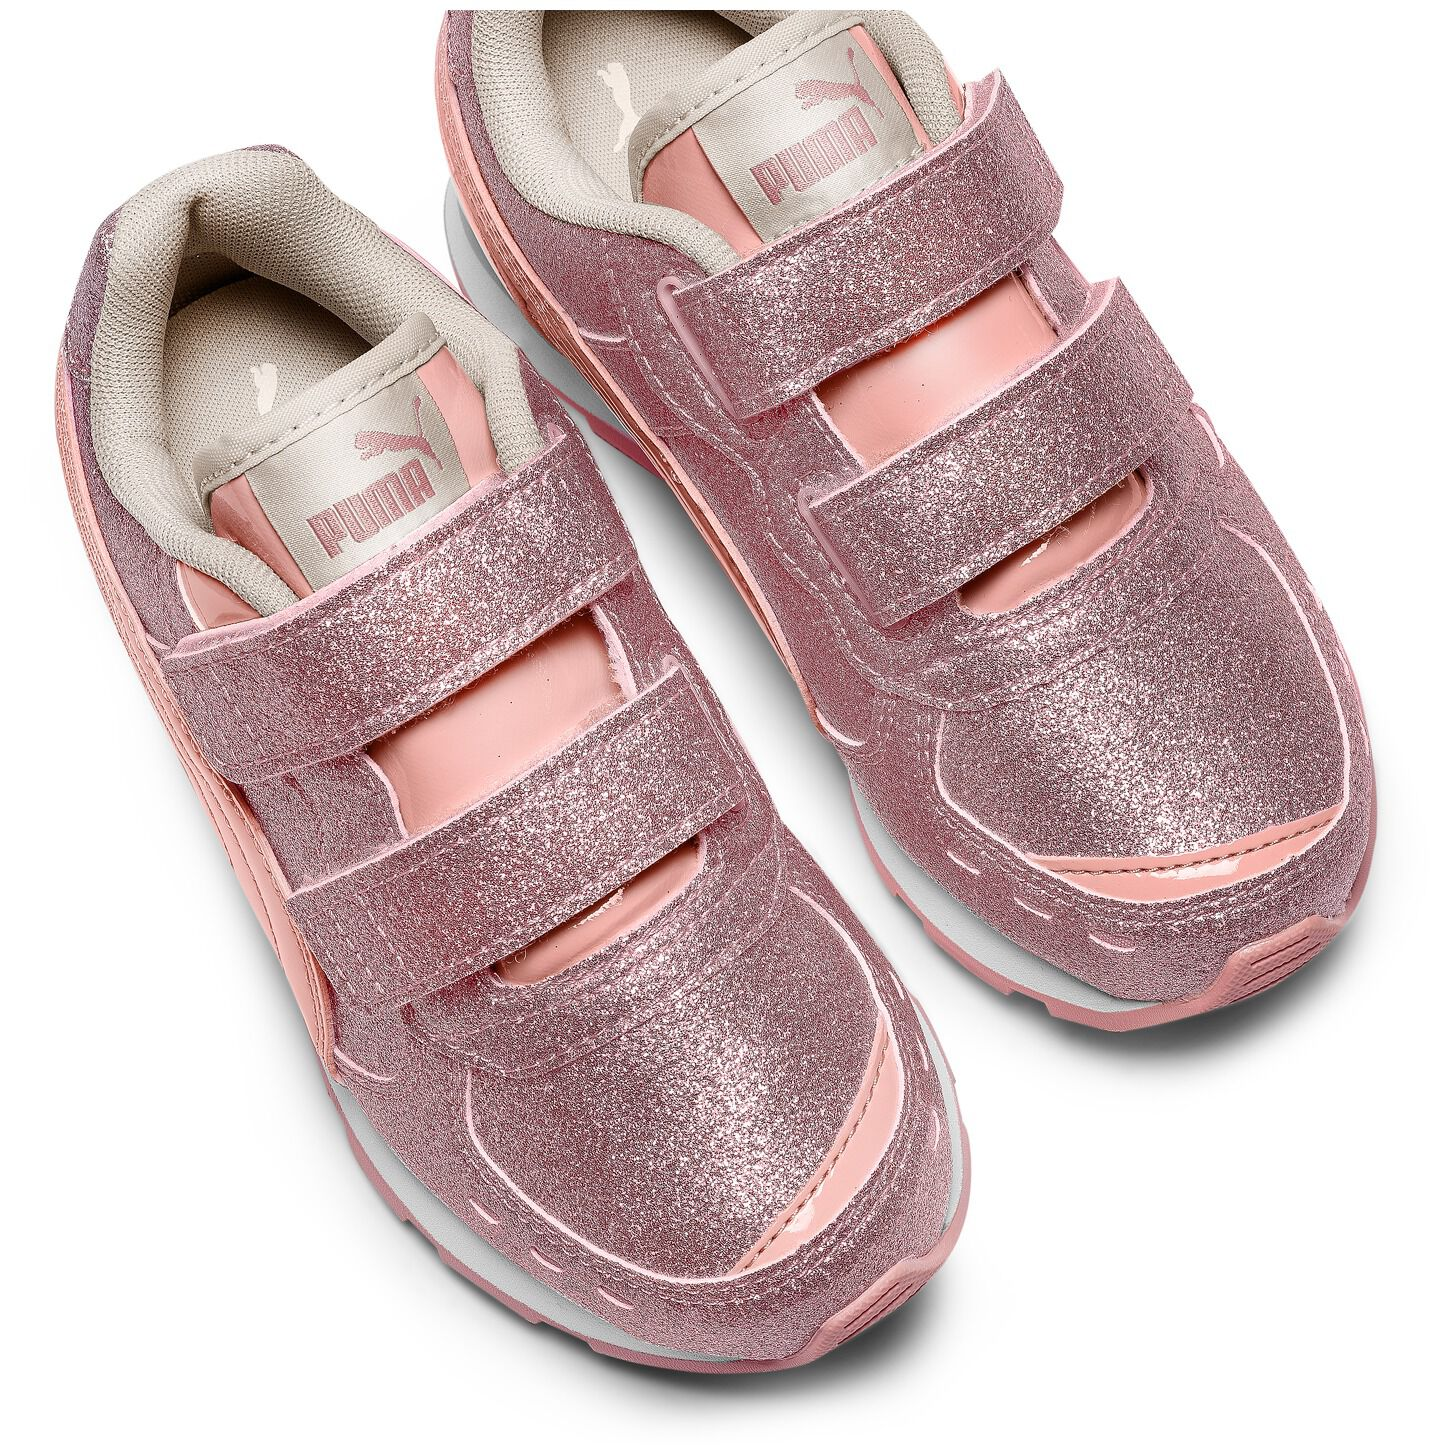 scarpe bimbo 21 converse